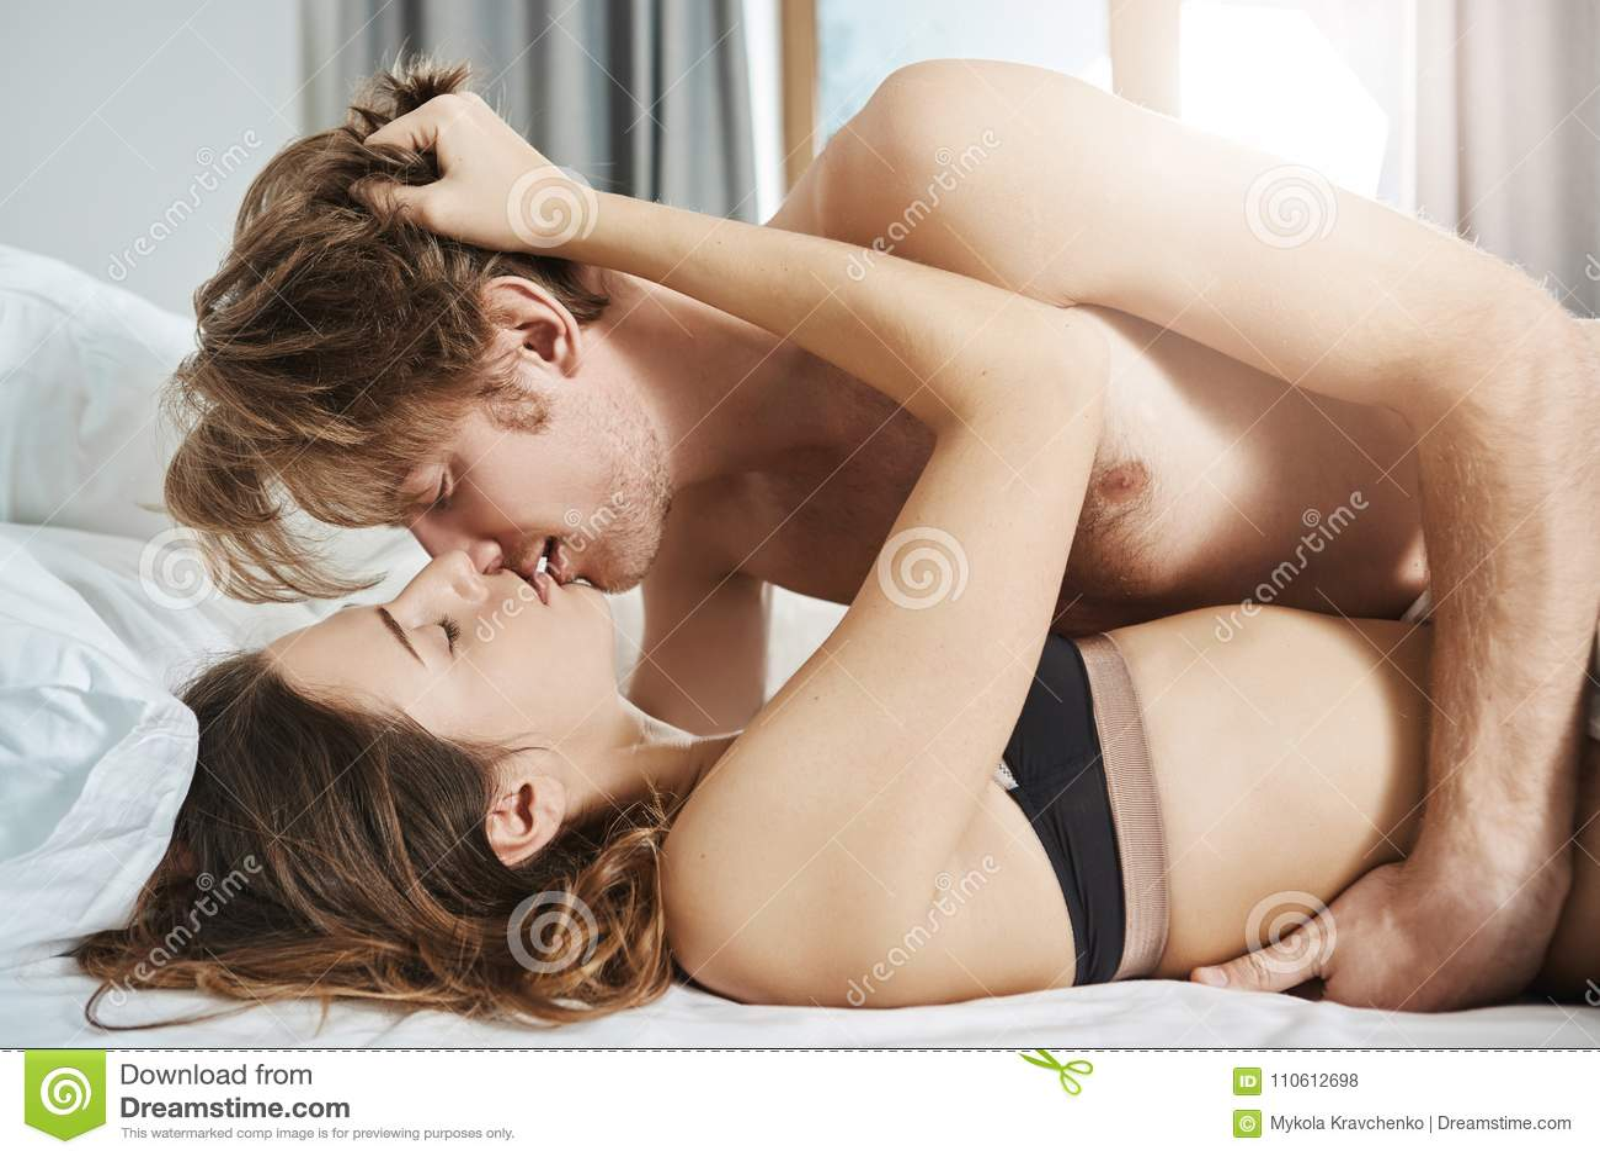 Kissing sex while Kissing